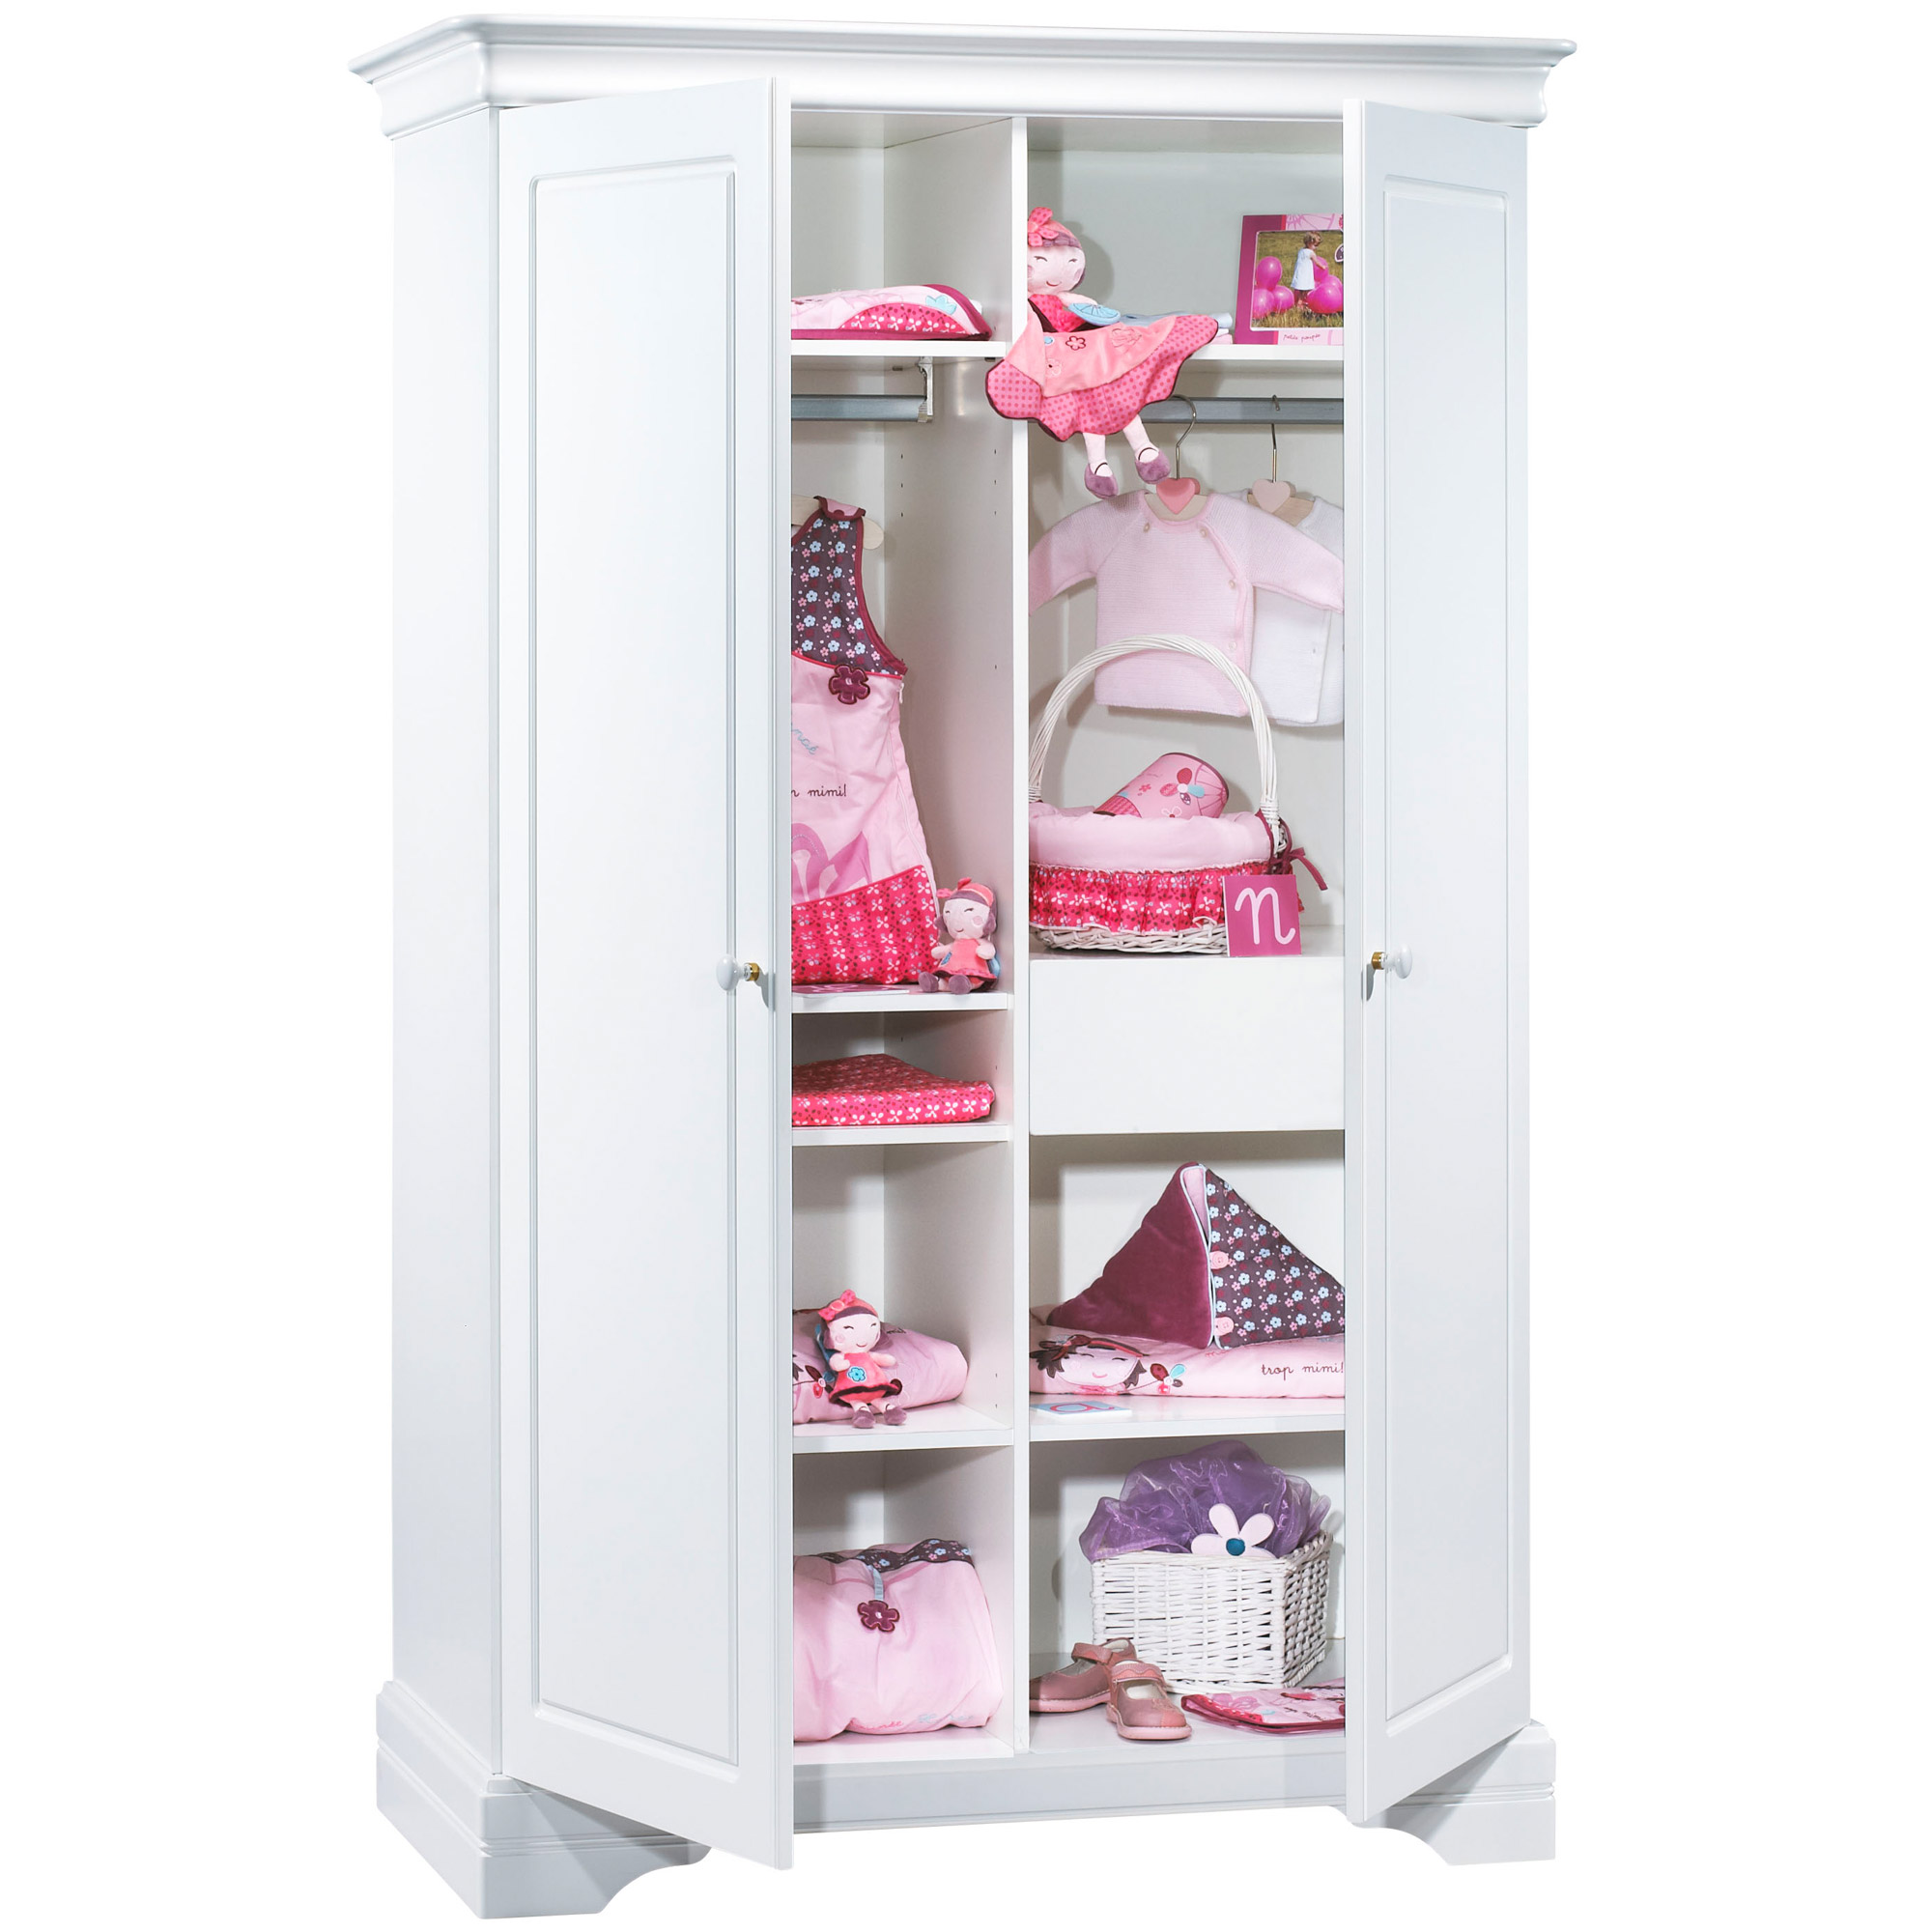 Elodie armoire 2 portes Blanc  de Sauthon Baby's Sweet Home